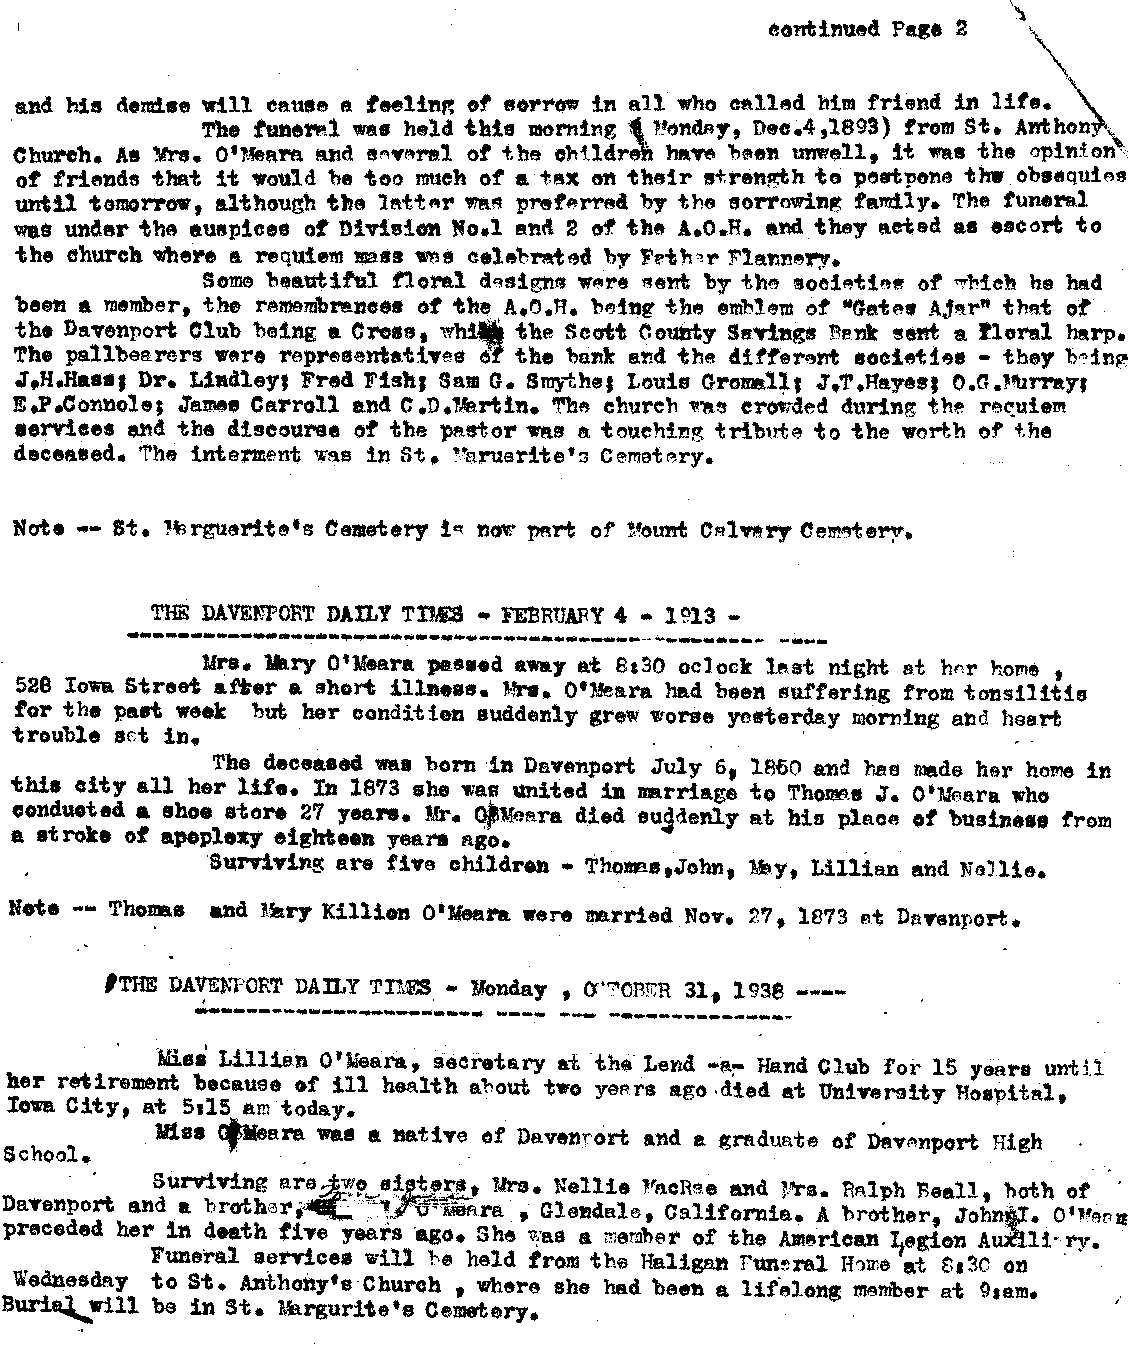 Thomas O'Meara Obit page 2